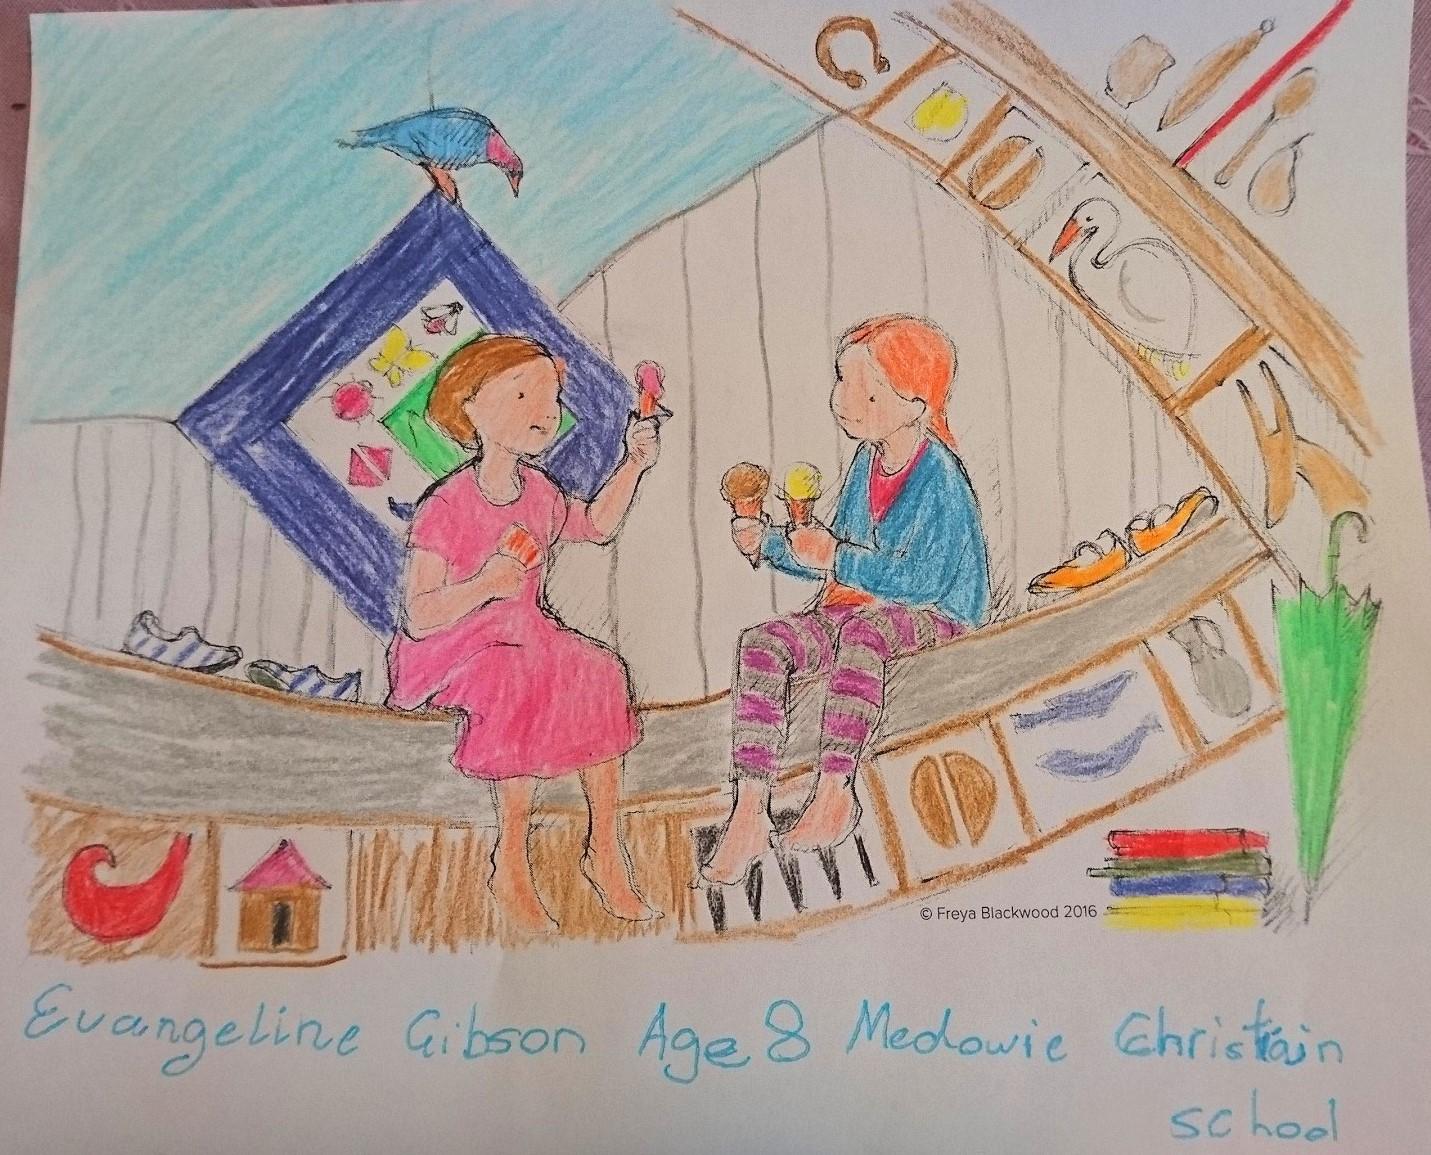 Evangeline G, age 8, Medowie Christian School, NSW.